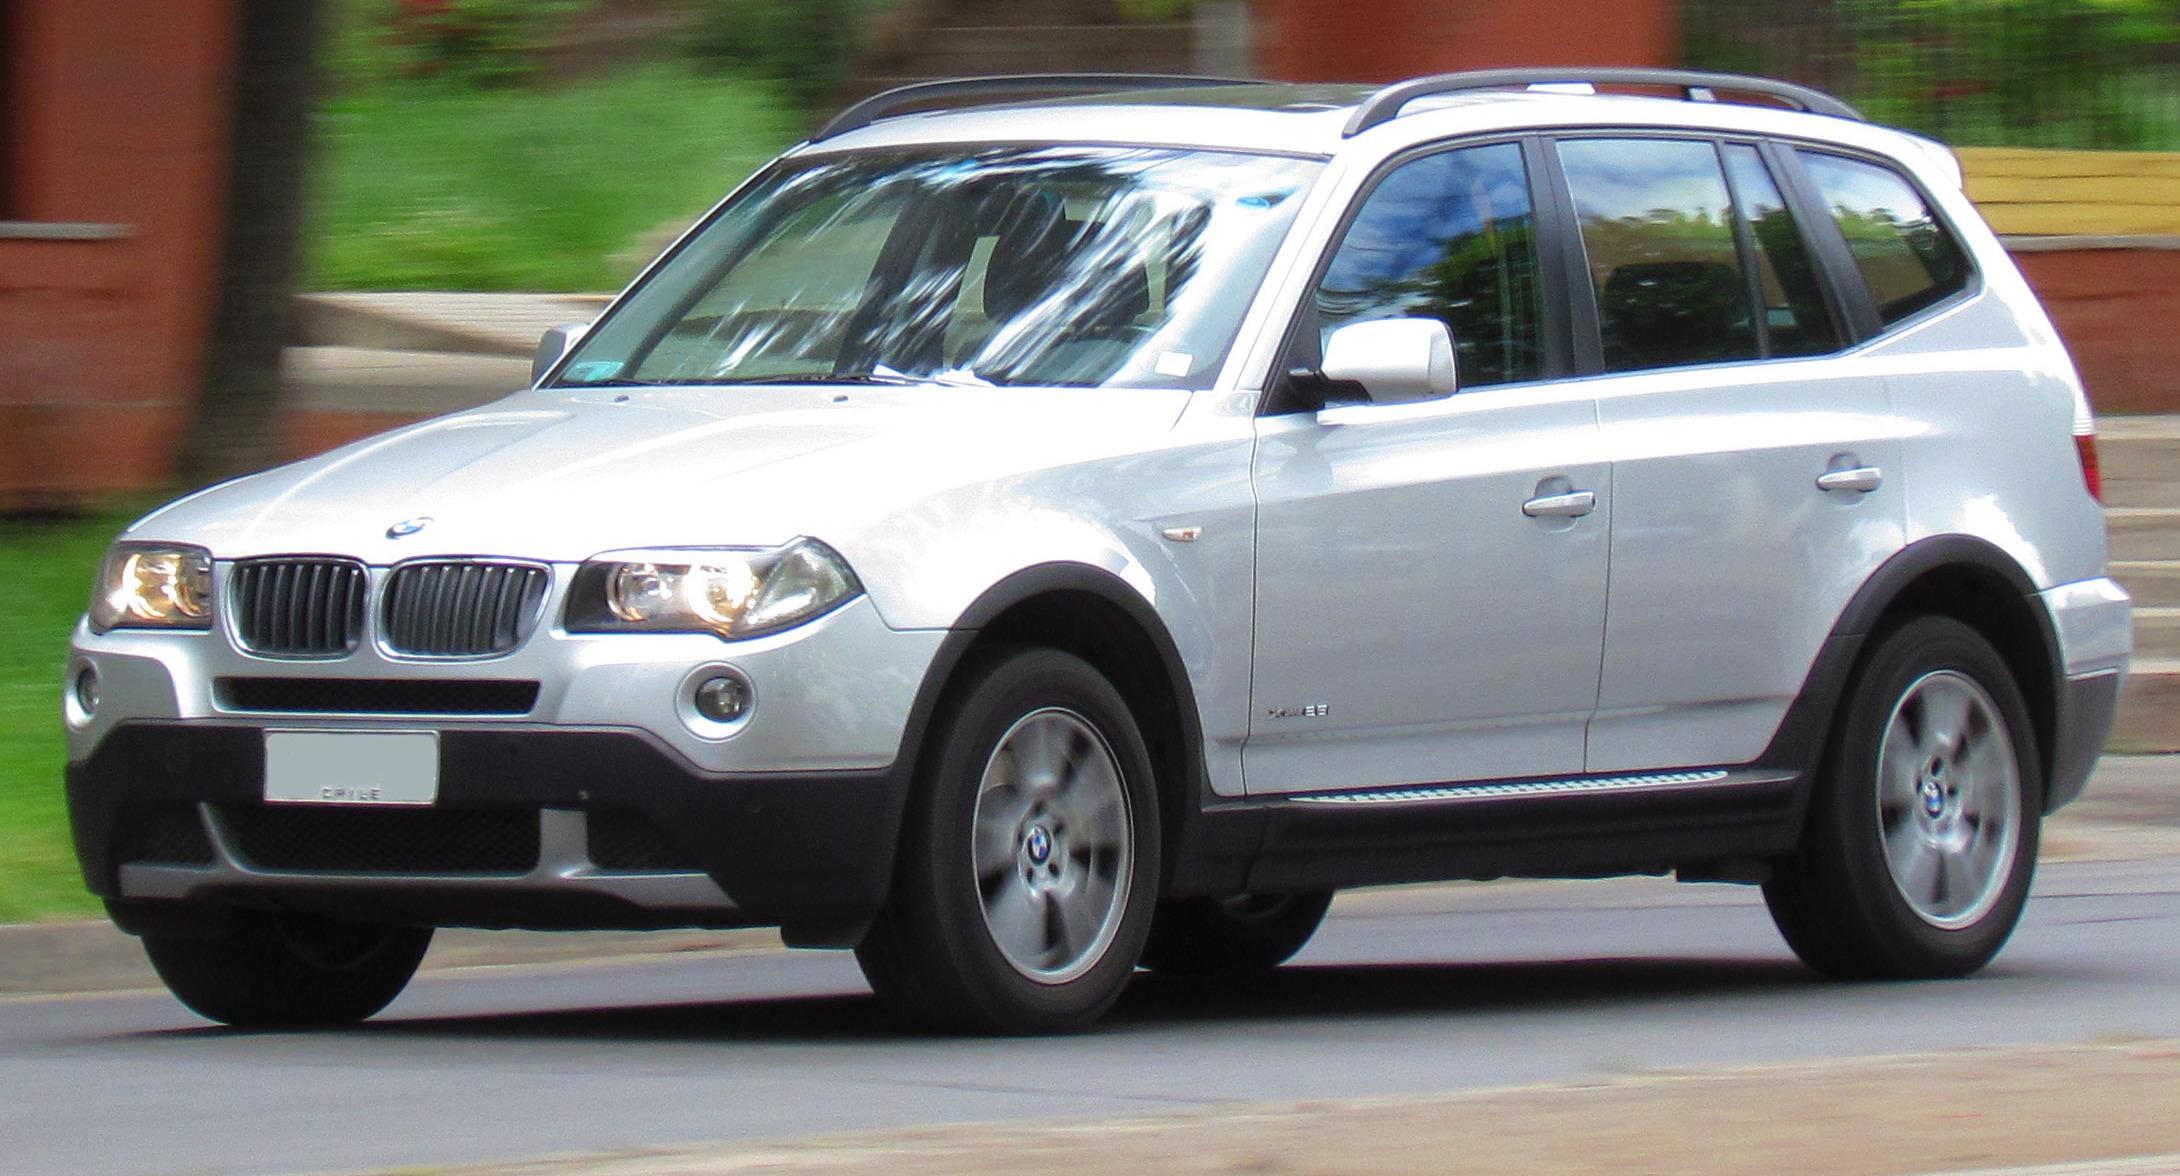 BMW X3 I (E83) 2003 - 2006 SUV 5 door #5